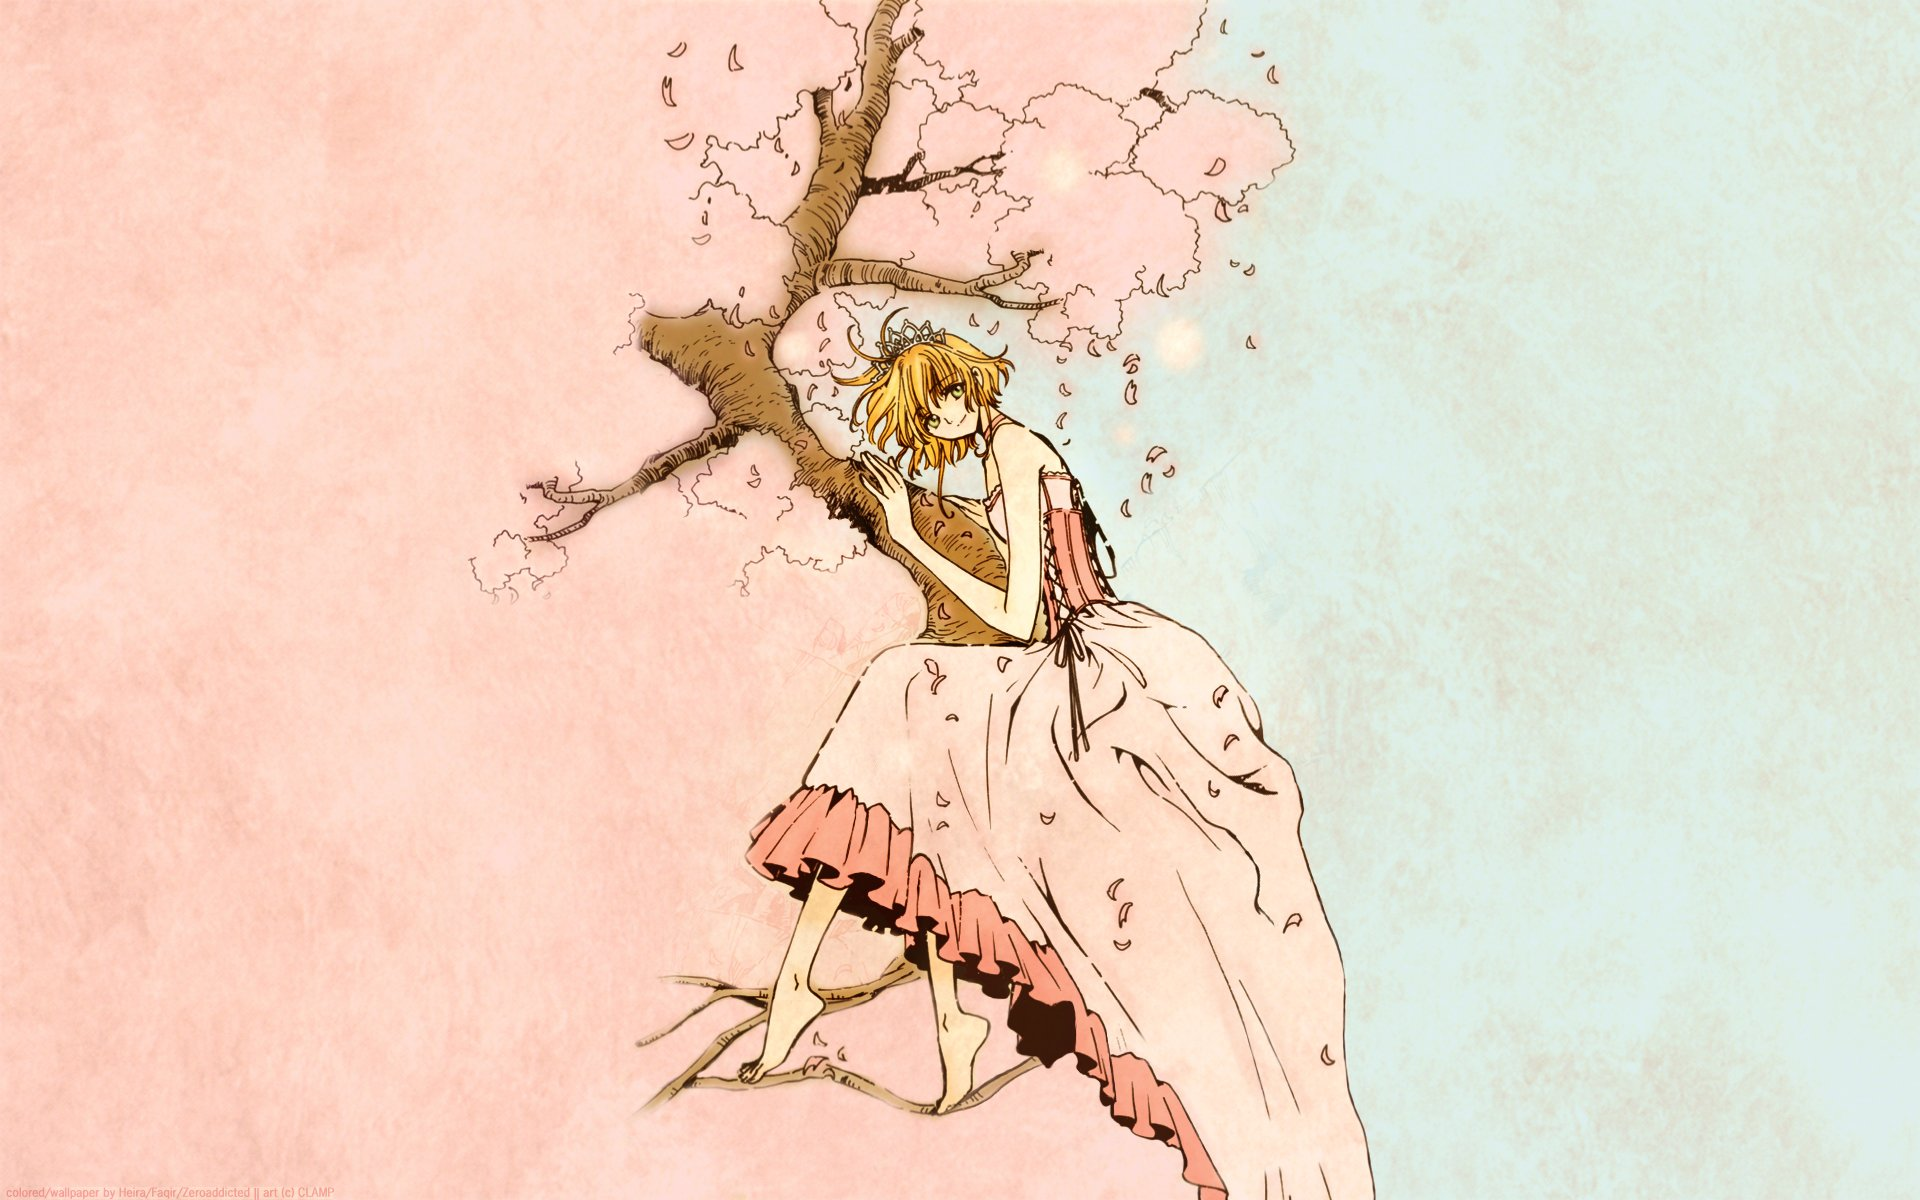 Tsubasa Reservoir Chronicle Hd Wallpaper Background Image 19x10 Id Wallpaper Abyss